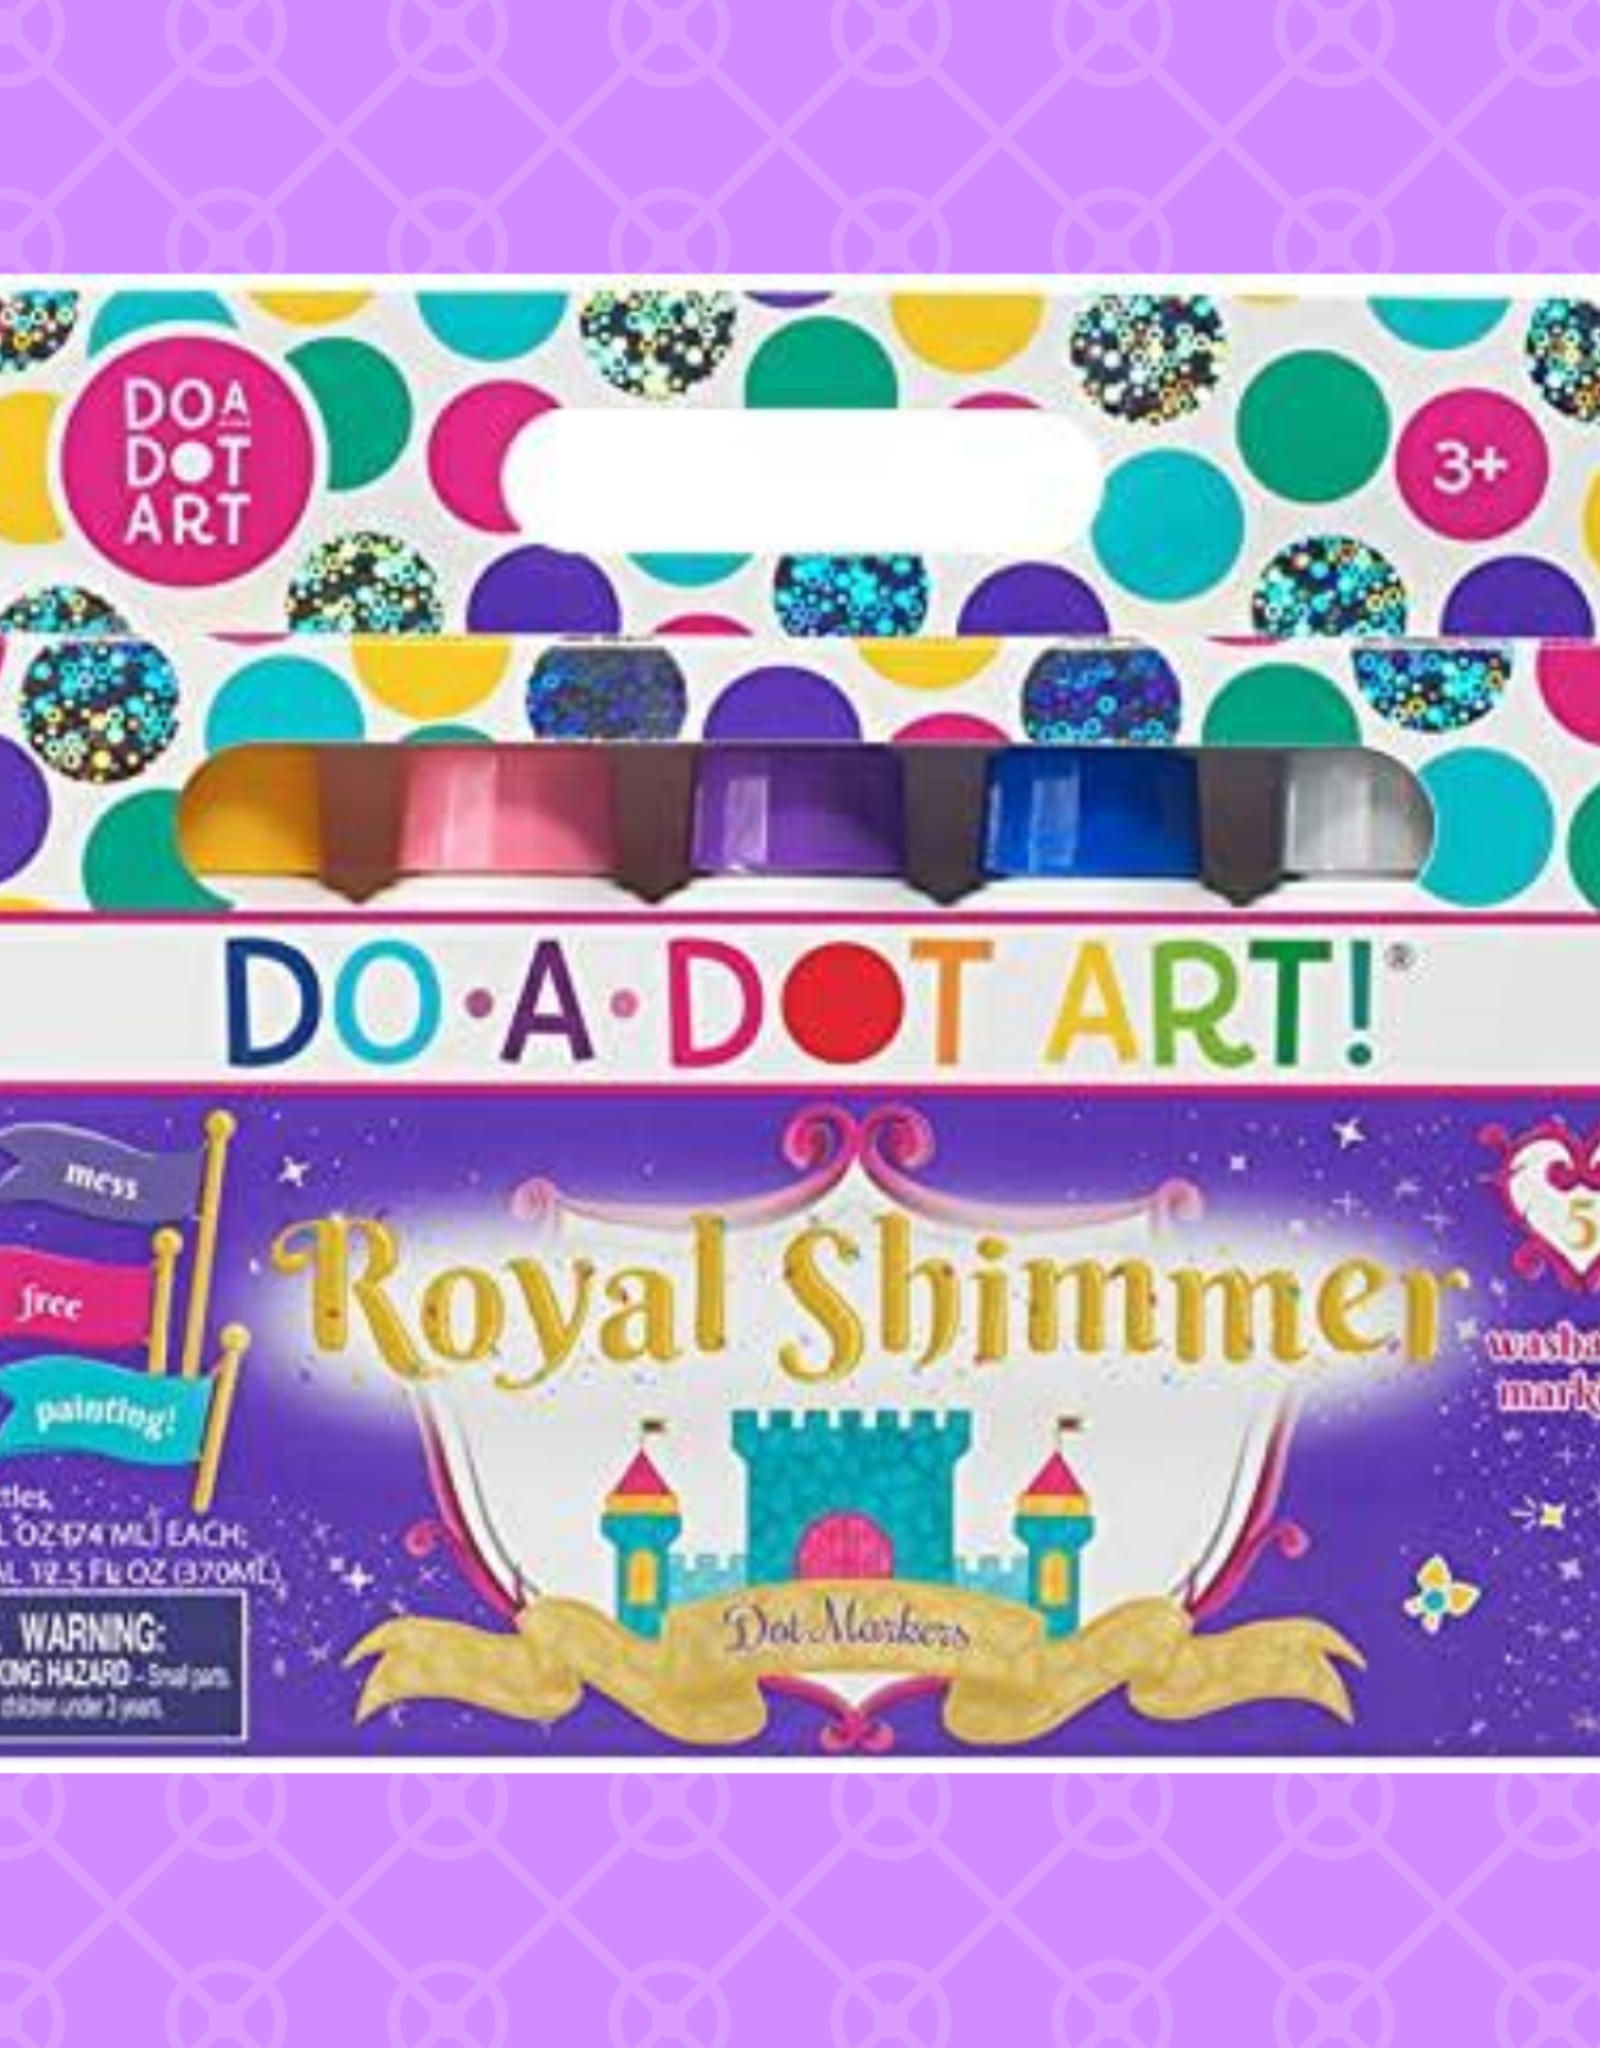 DO A DOT ROYAL SHIMMER 5 PAINT